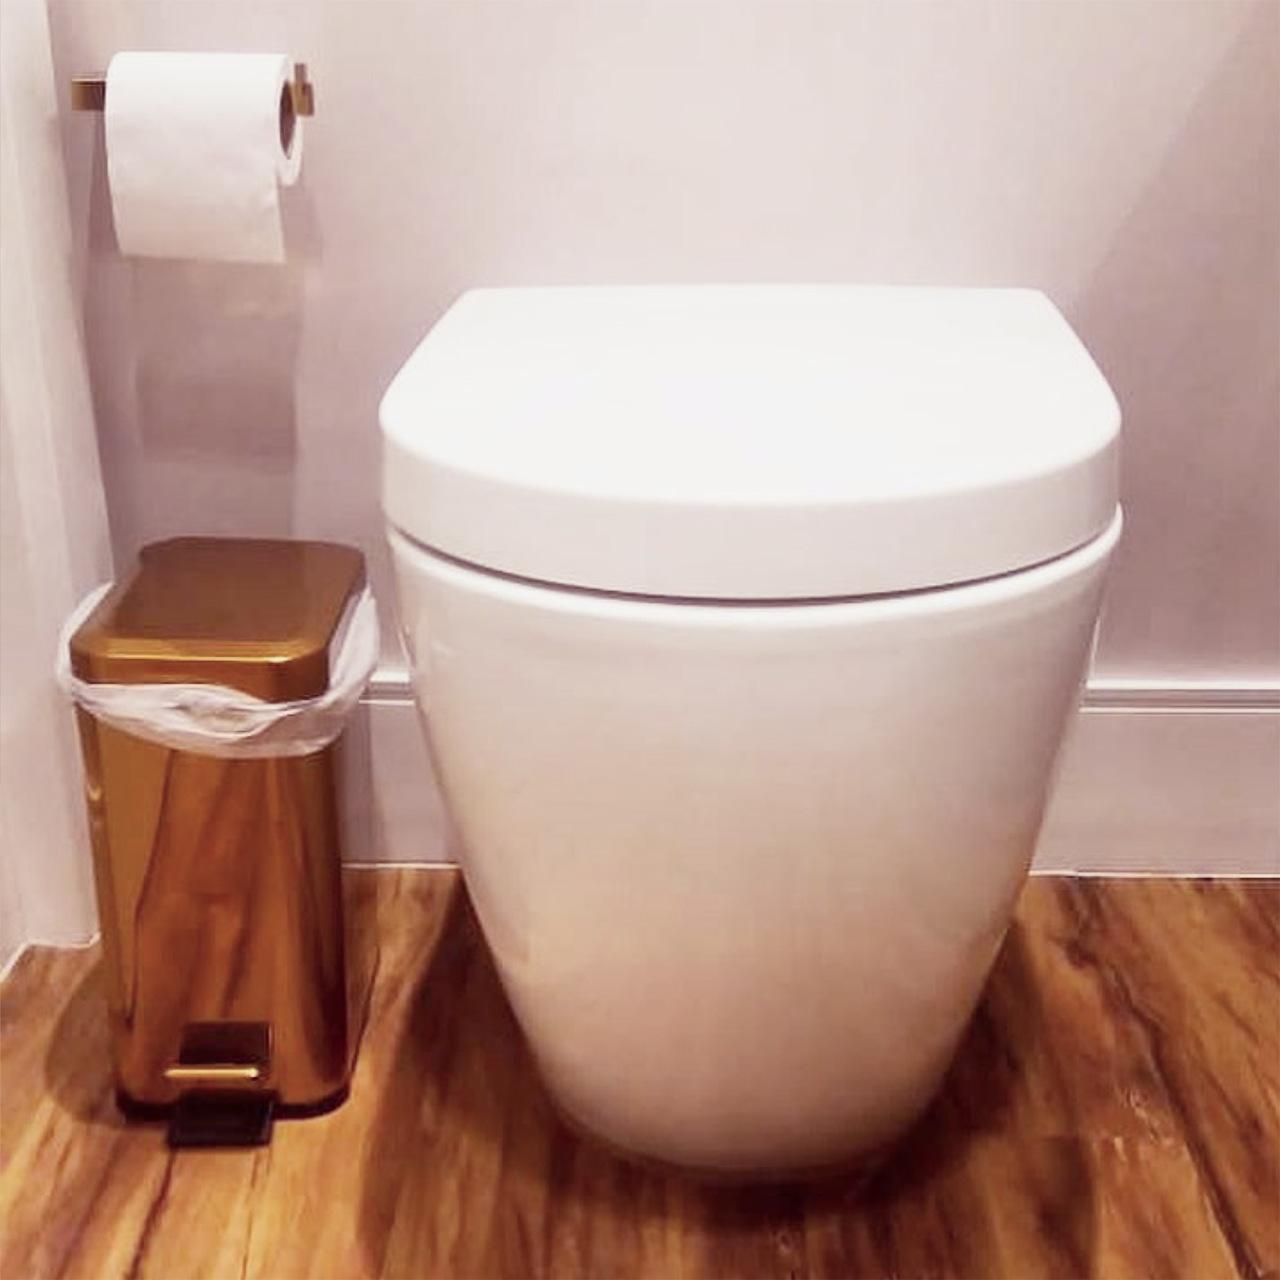 Vaso Sanitário Convencional Redondo Branco Nias